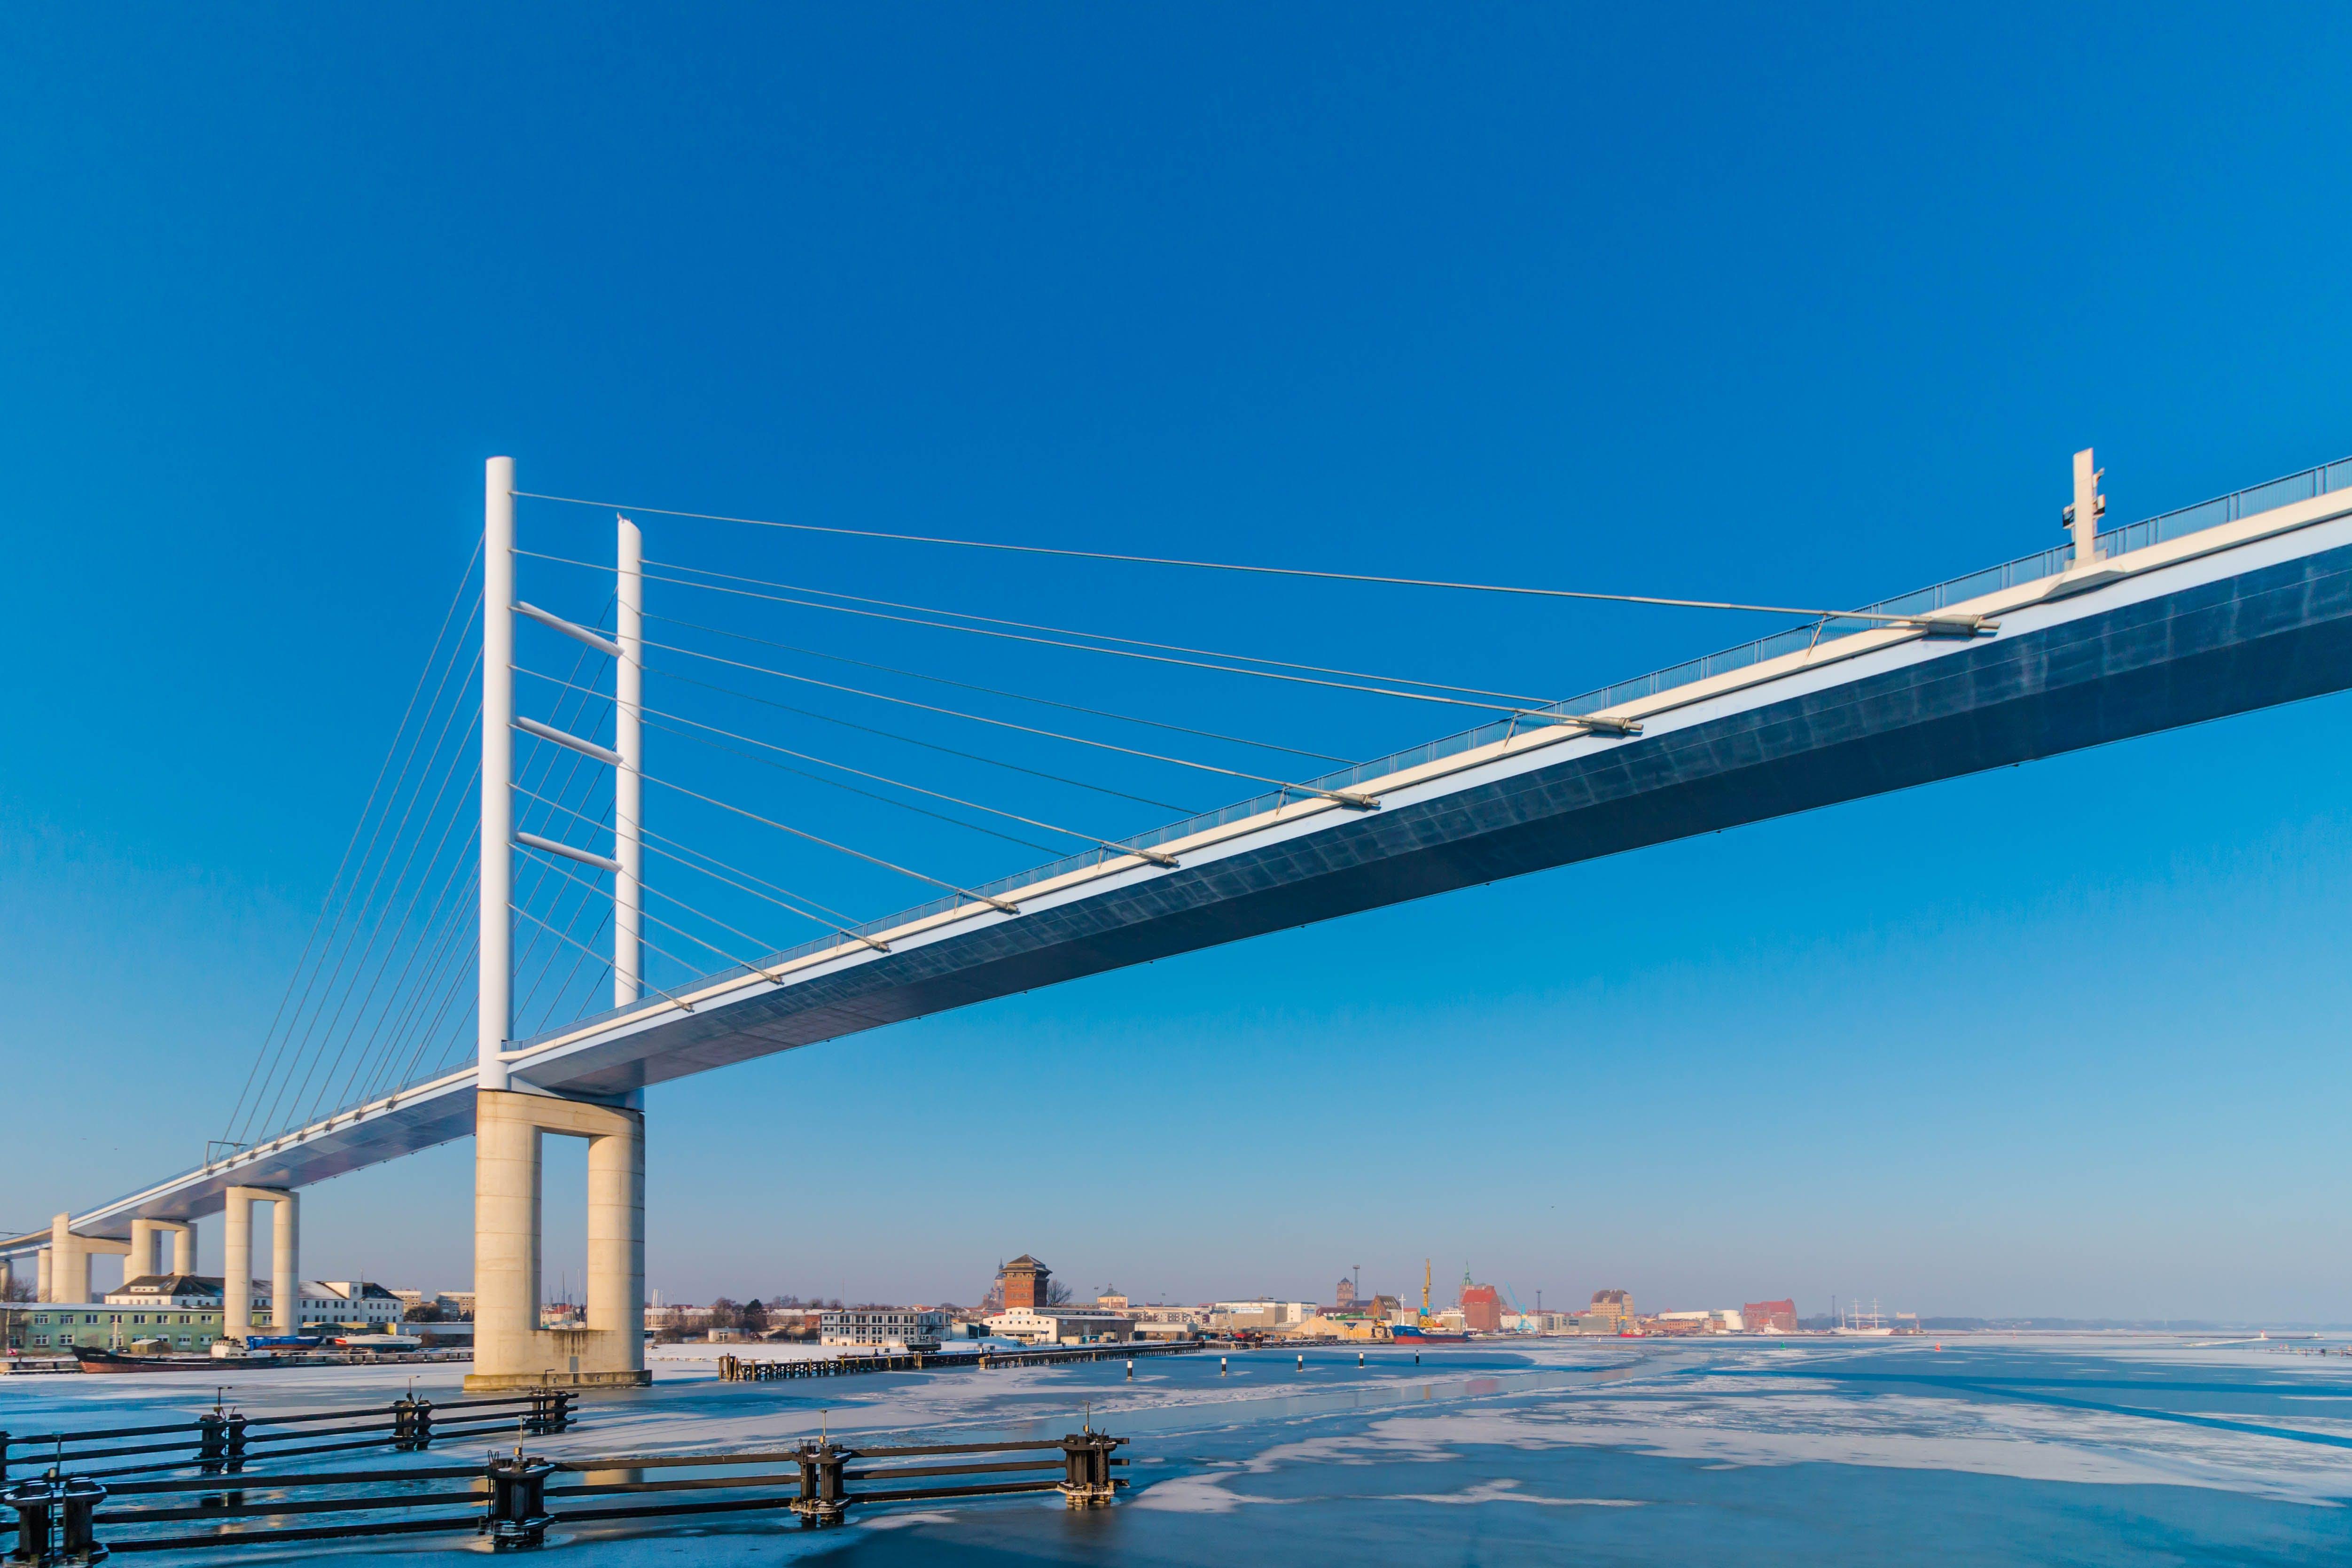 White Metal Bridge Under the Blue Sky